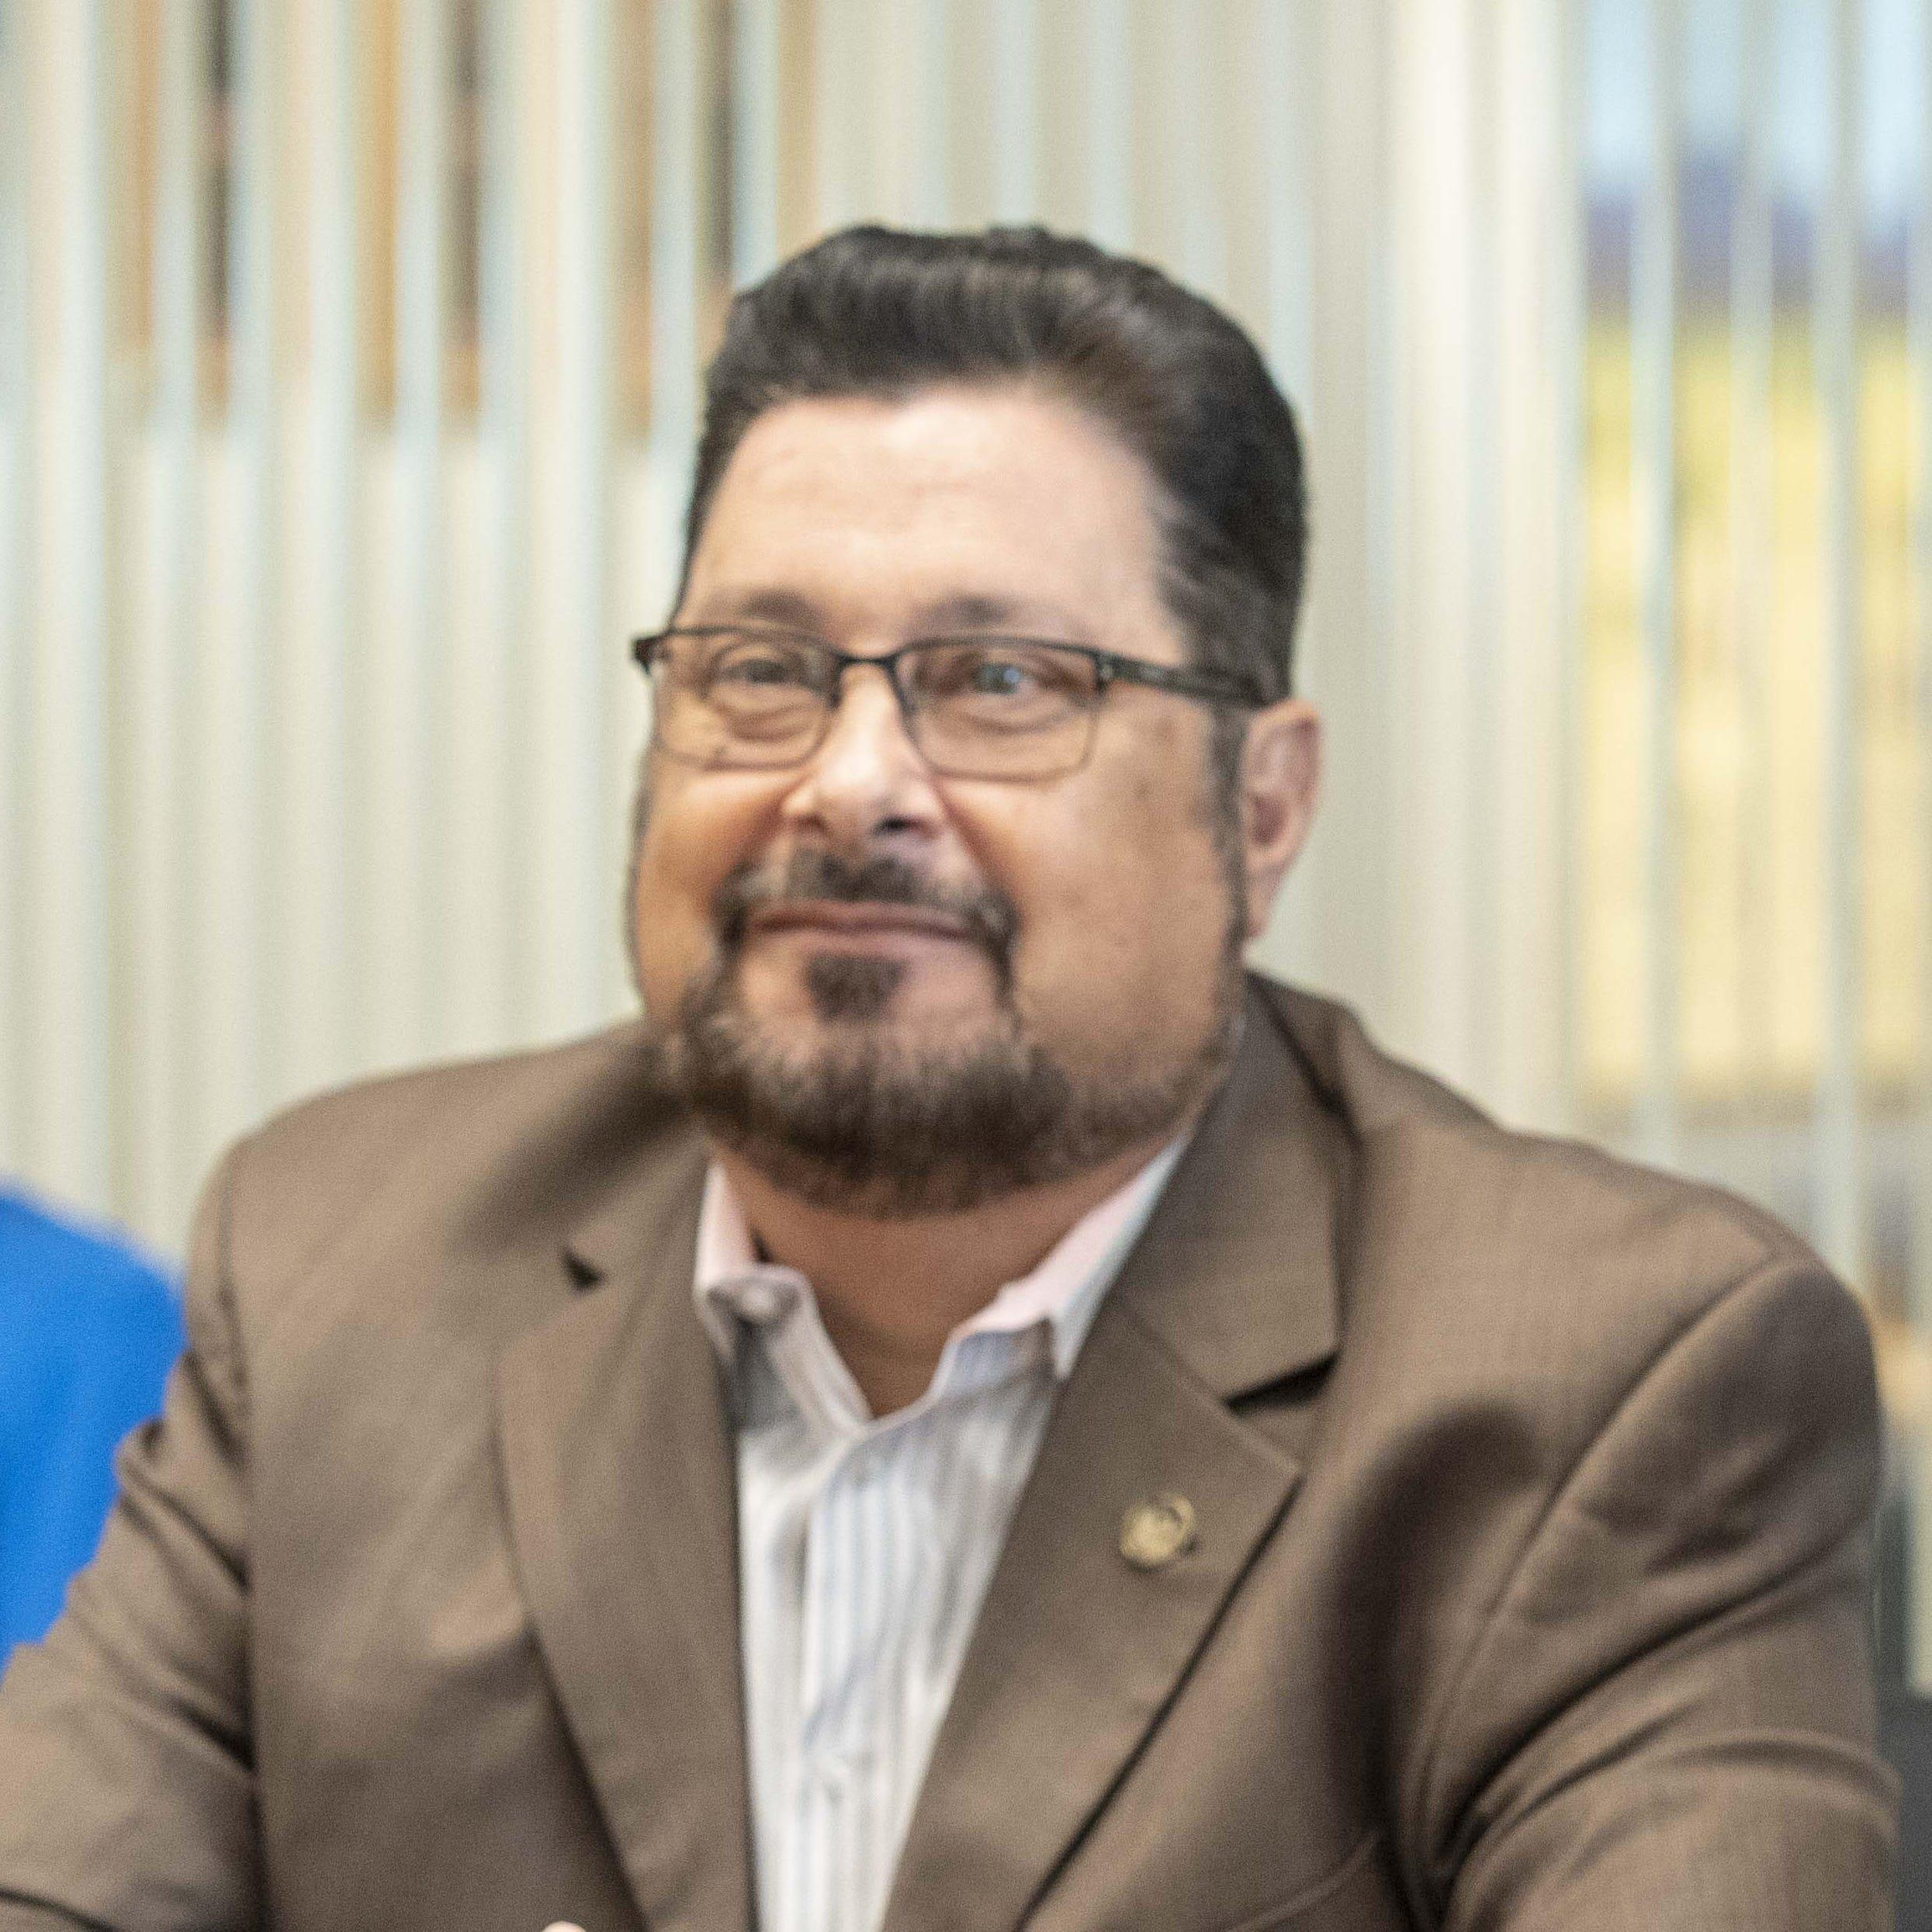 Phoenix Councilman Michael Nowakowski wins in court, won't face recall